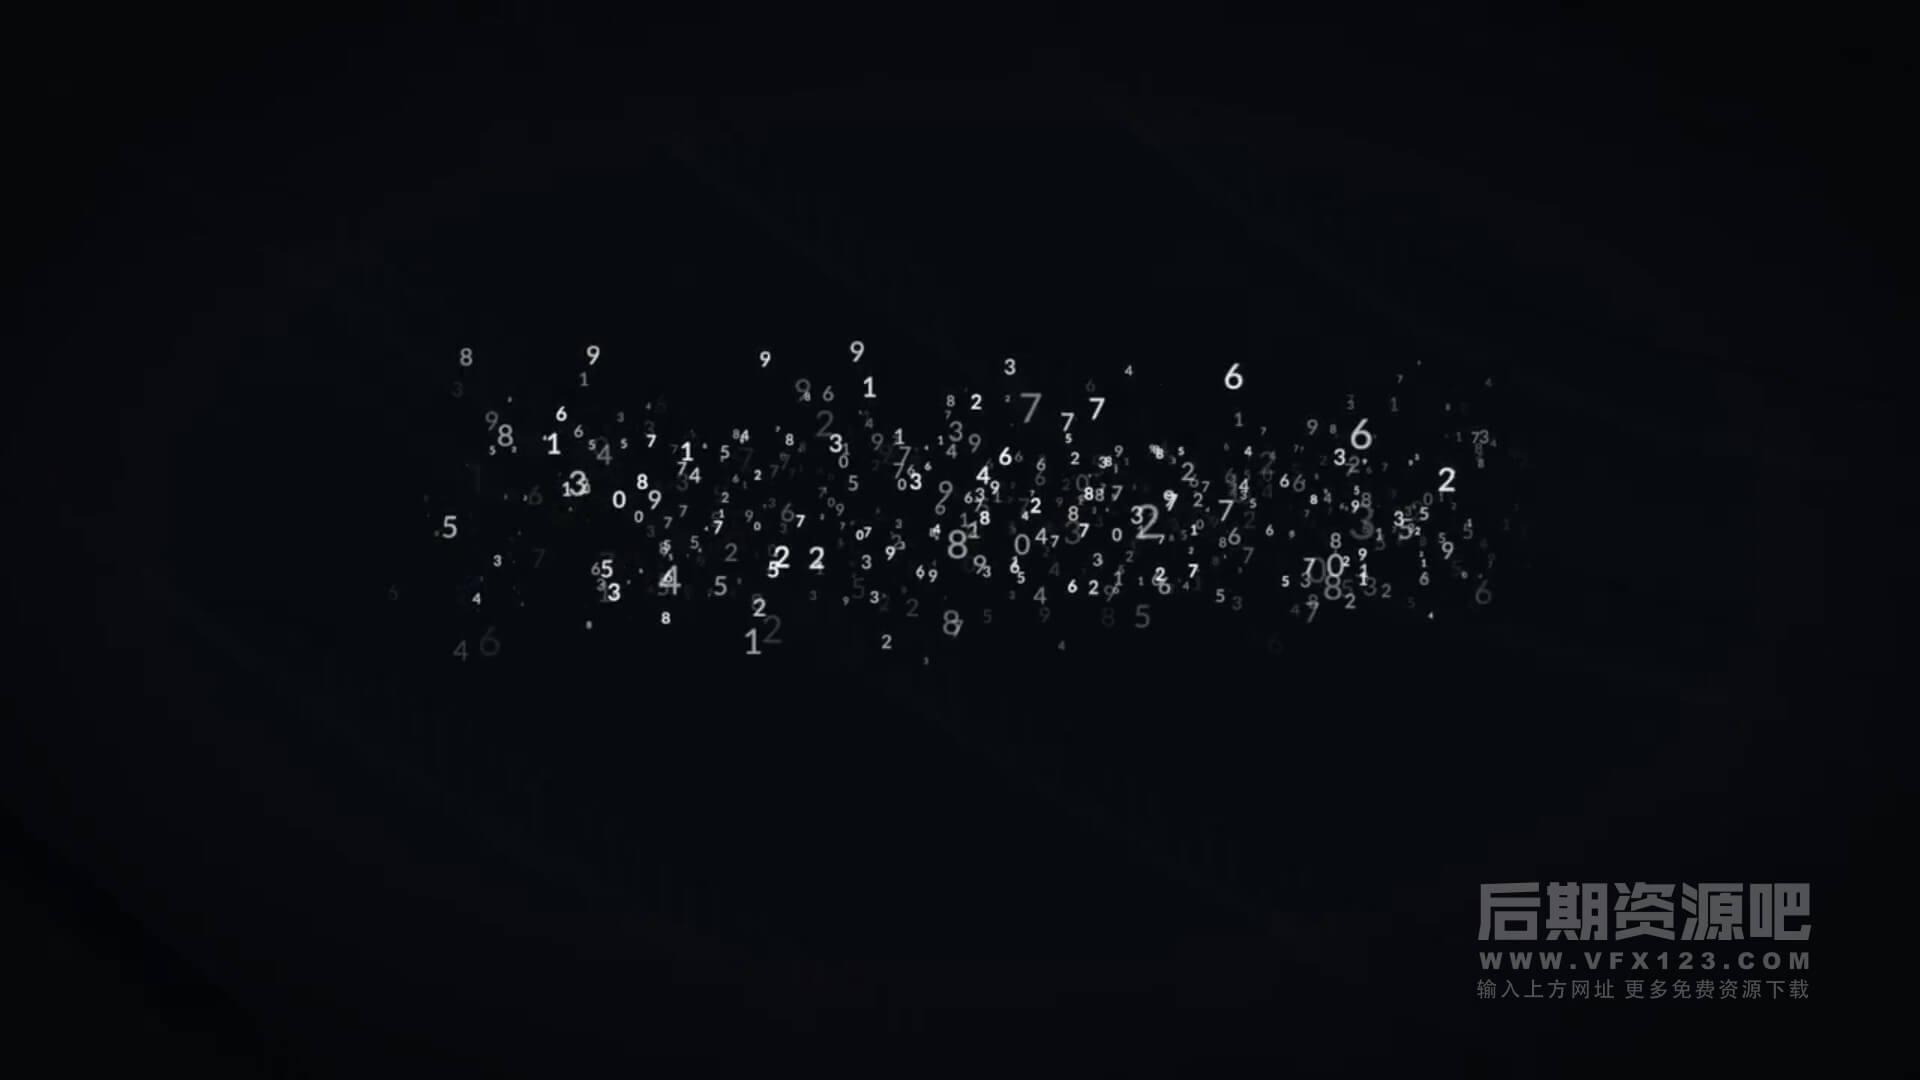 fcpx标题动画 8种数字飞散粒子动画效果模板 Titles Animator Number Reveal